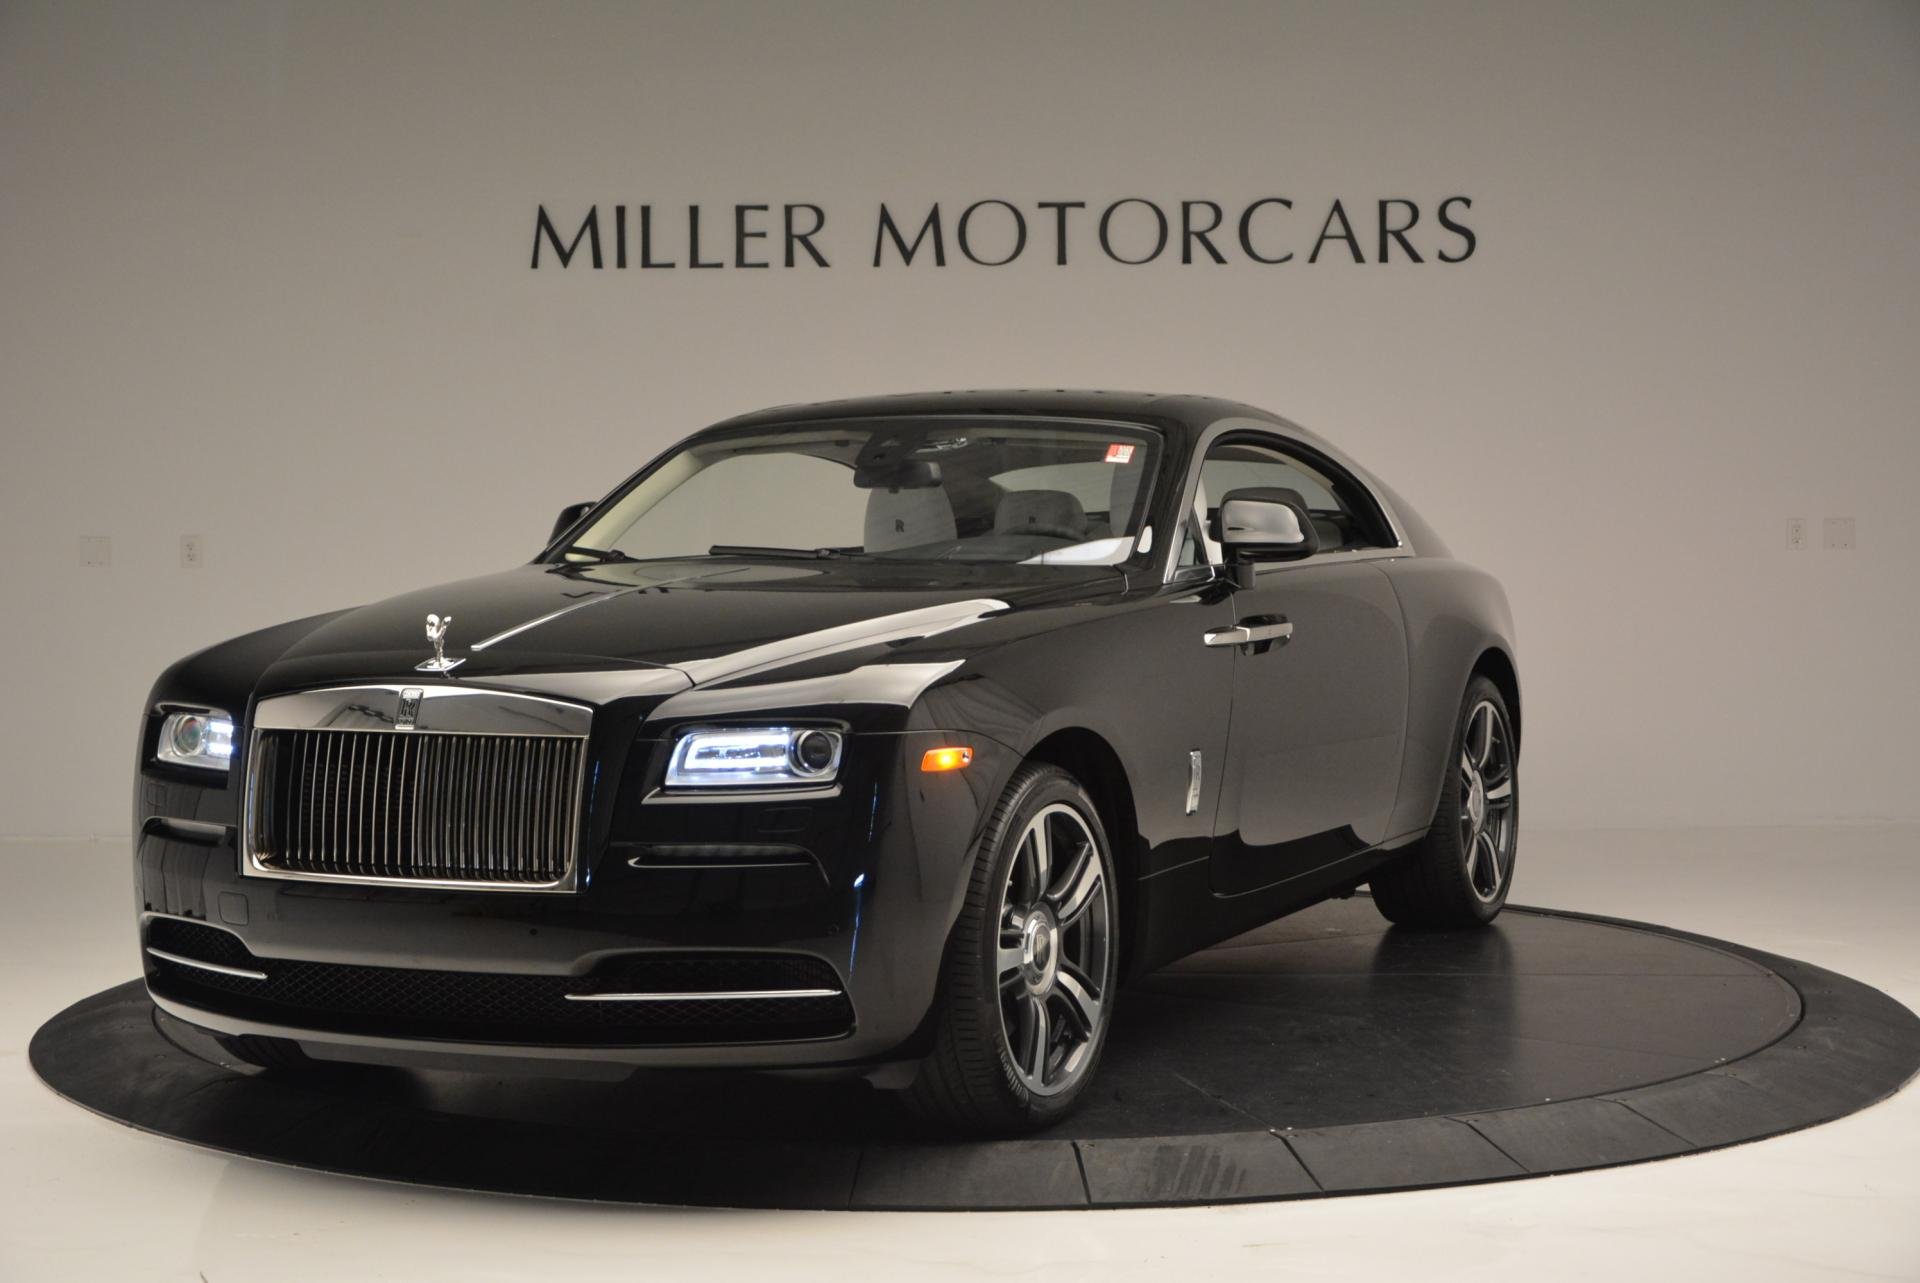 New 2016 Rolls-Royce Wraith for sale Sold at Alfa Romeo of Westport in Westport CT 06880 1